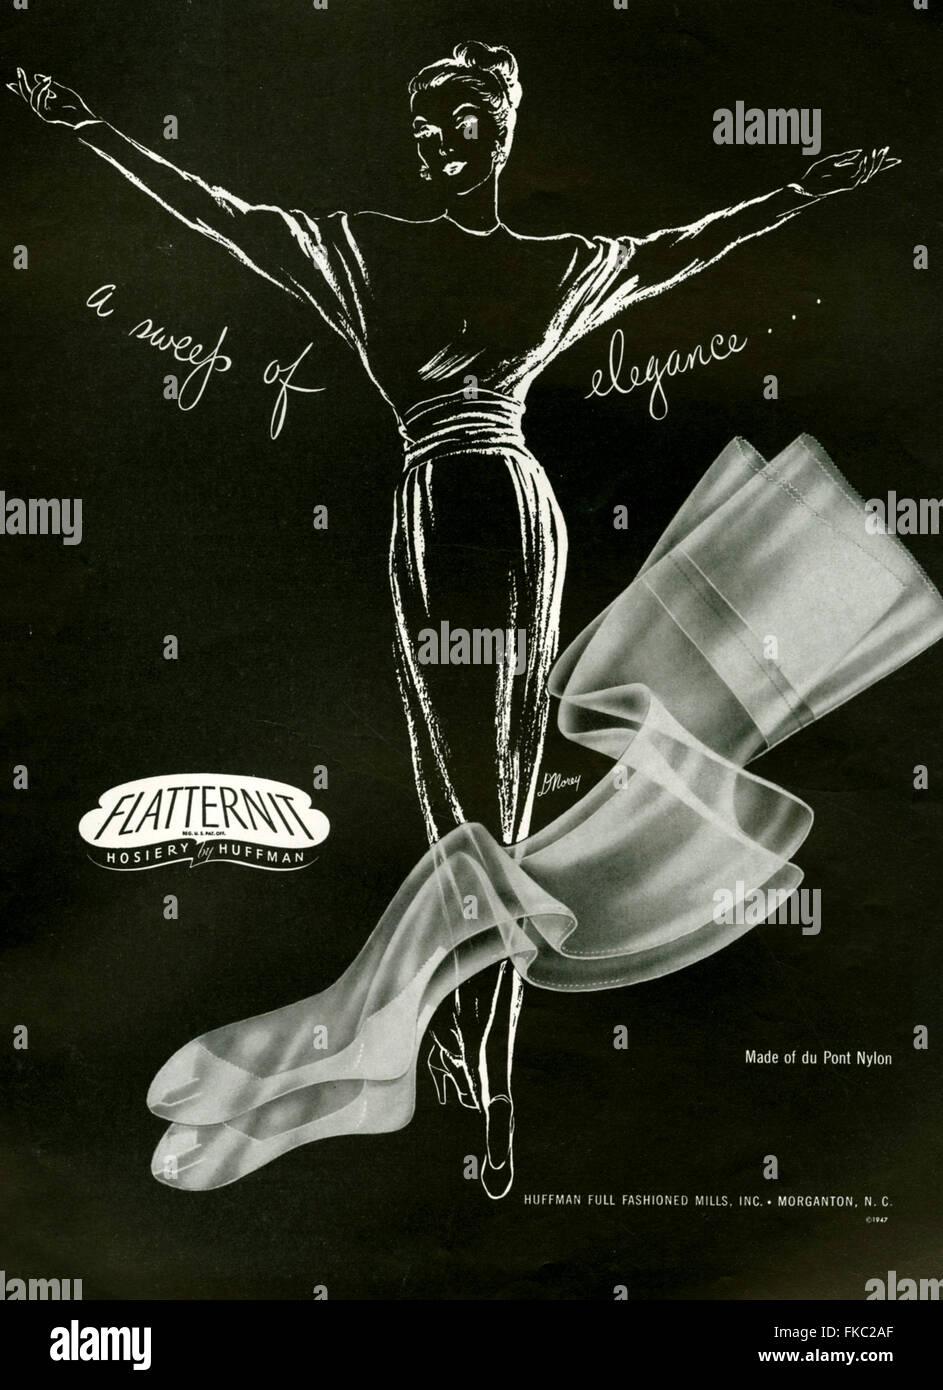 1940s  Huffman Magazine Advert - Stock Image